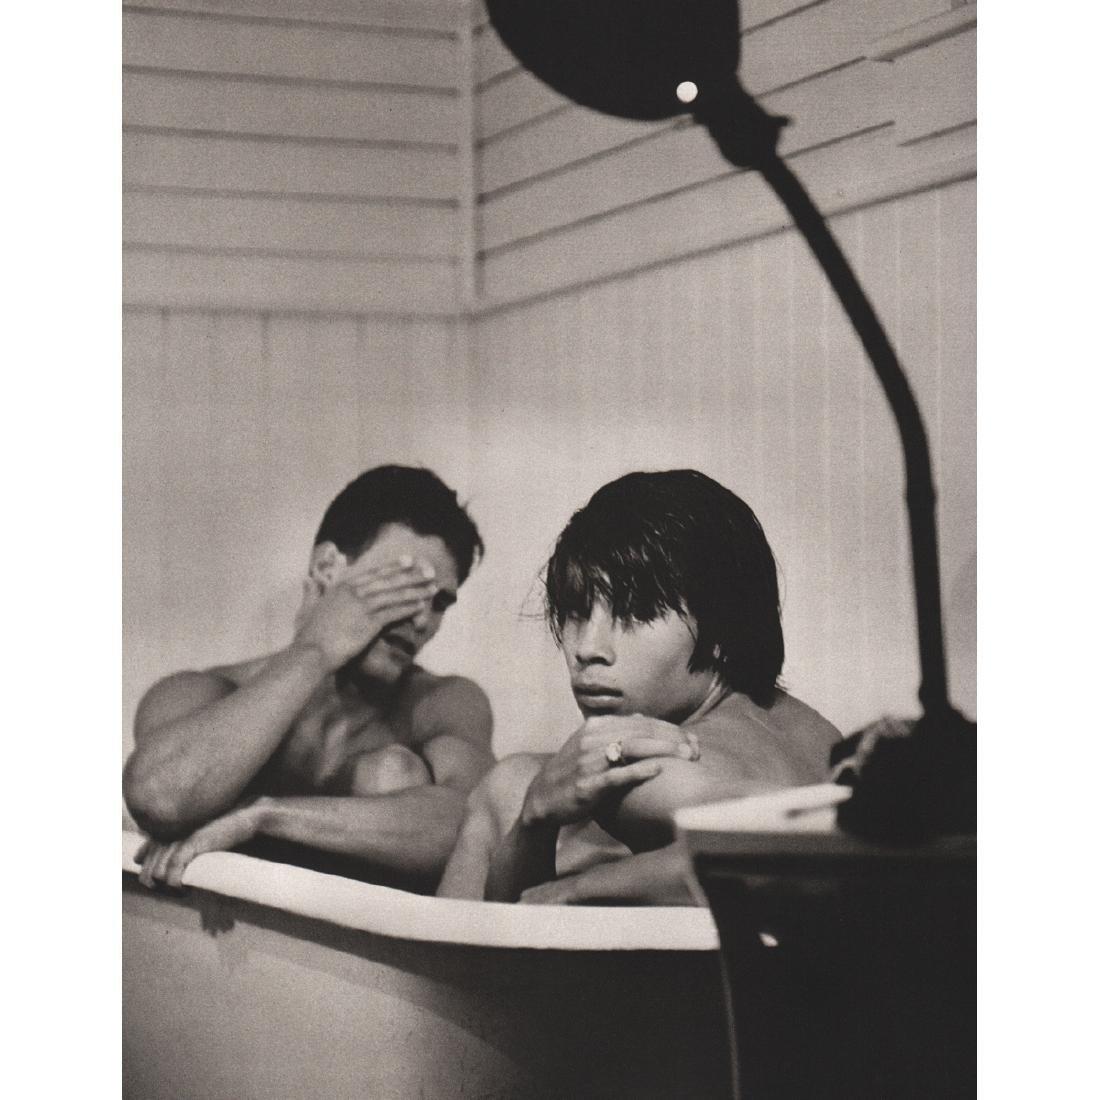 BRUCE WEBER - Brendan Kelly, Boxer, NYC 1986